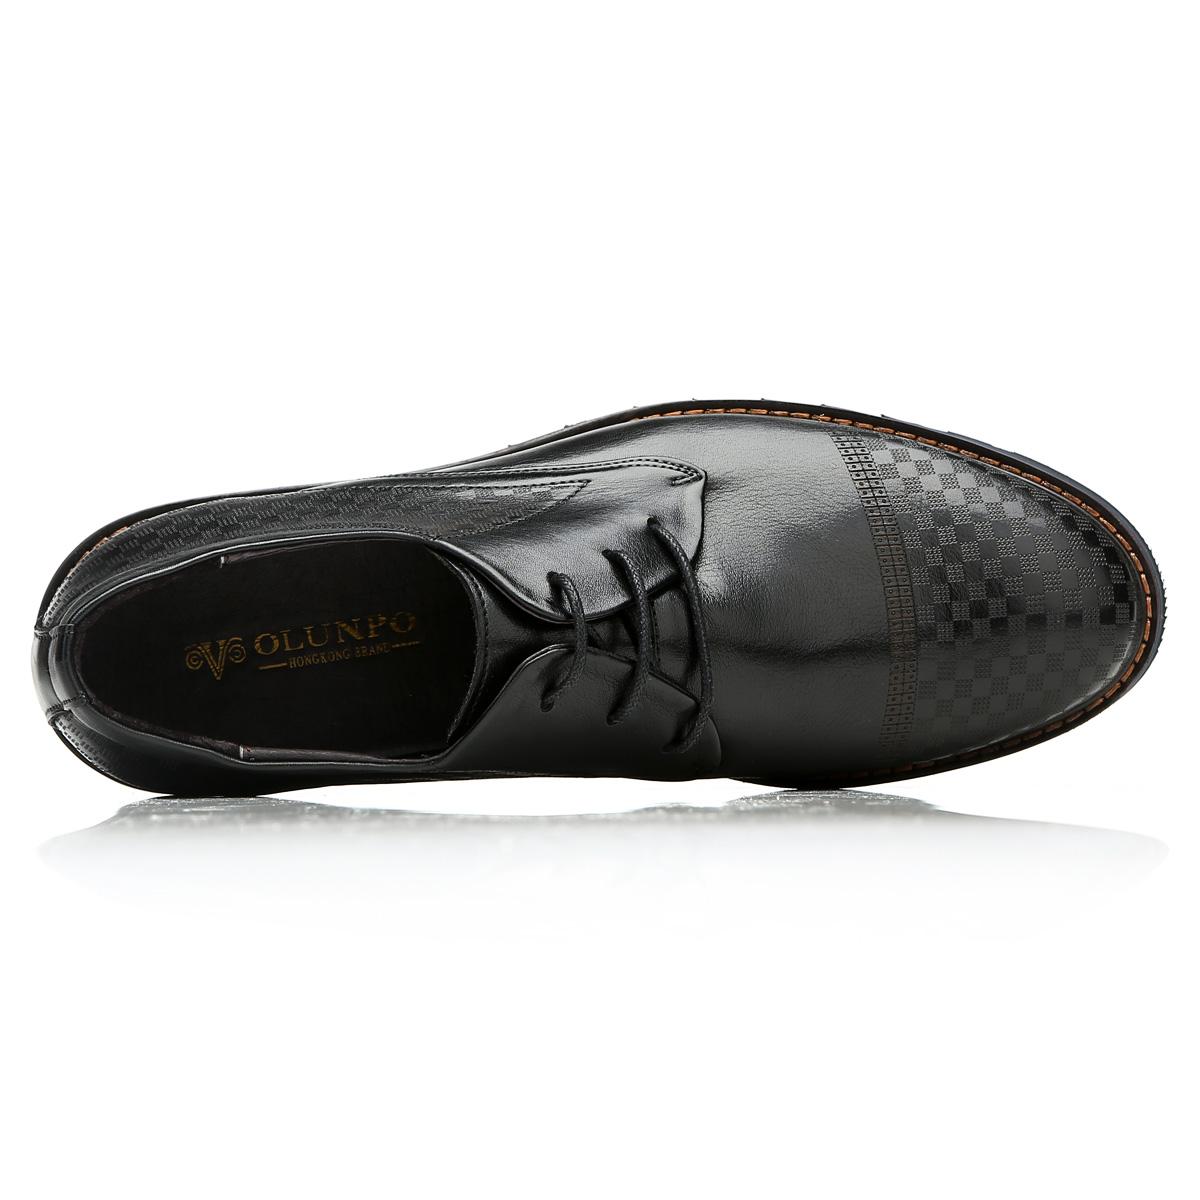 Giày da nam Olunpo QMD1401 phối màu độc đáo